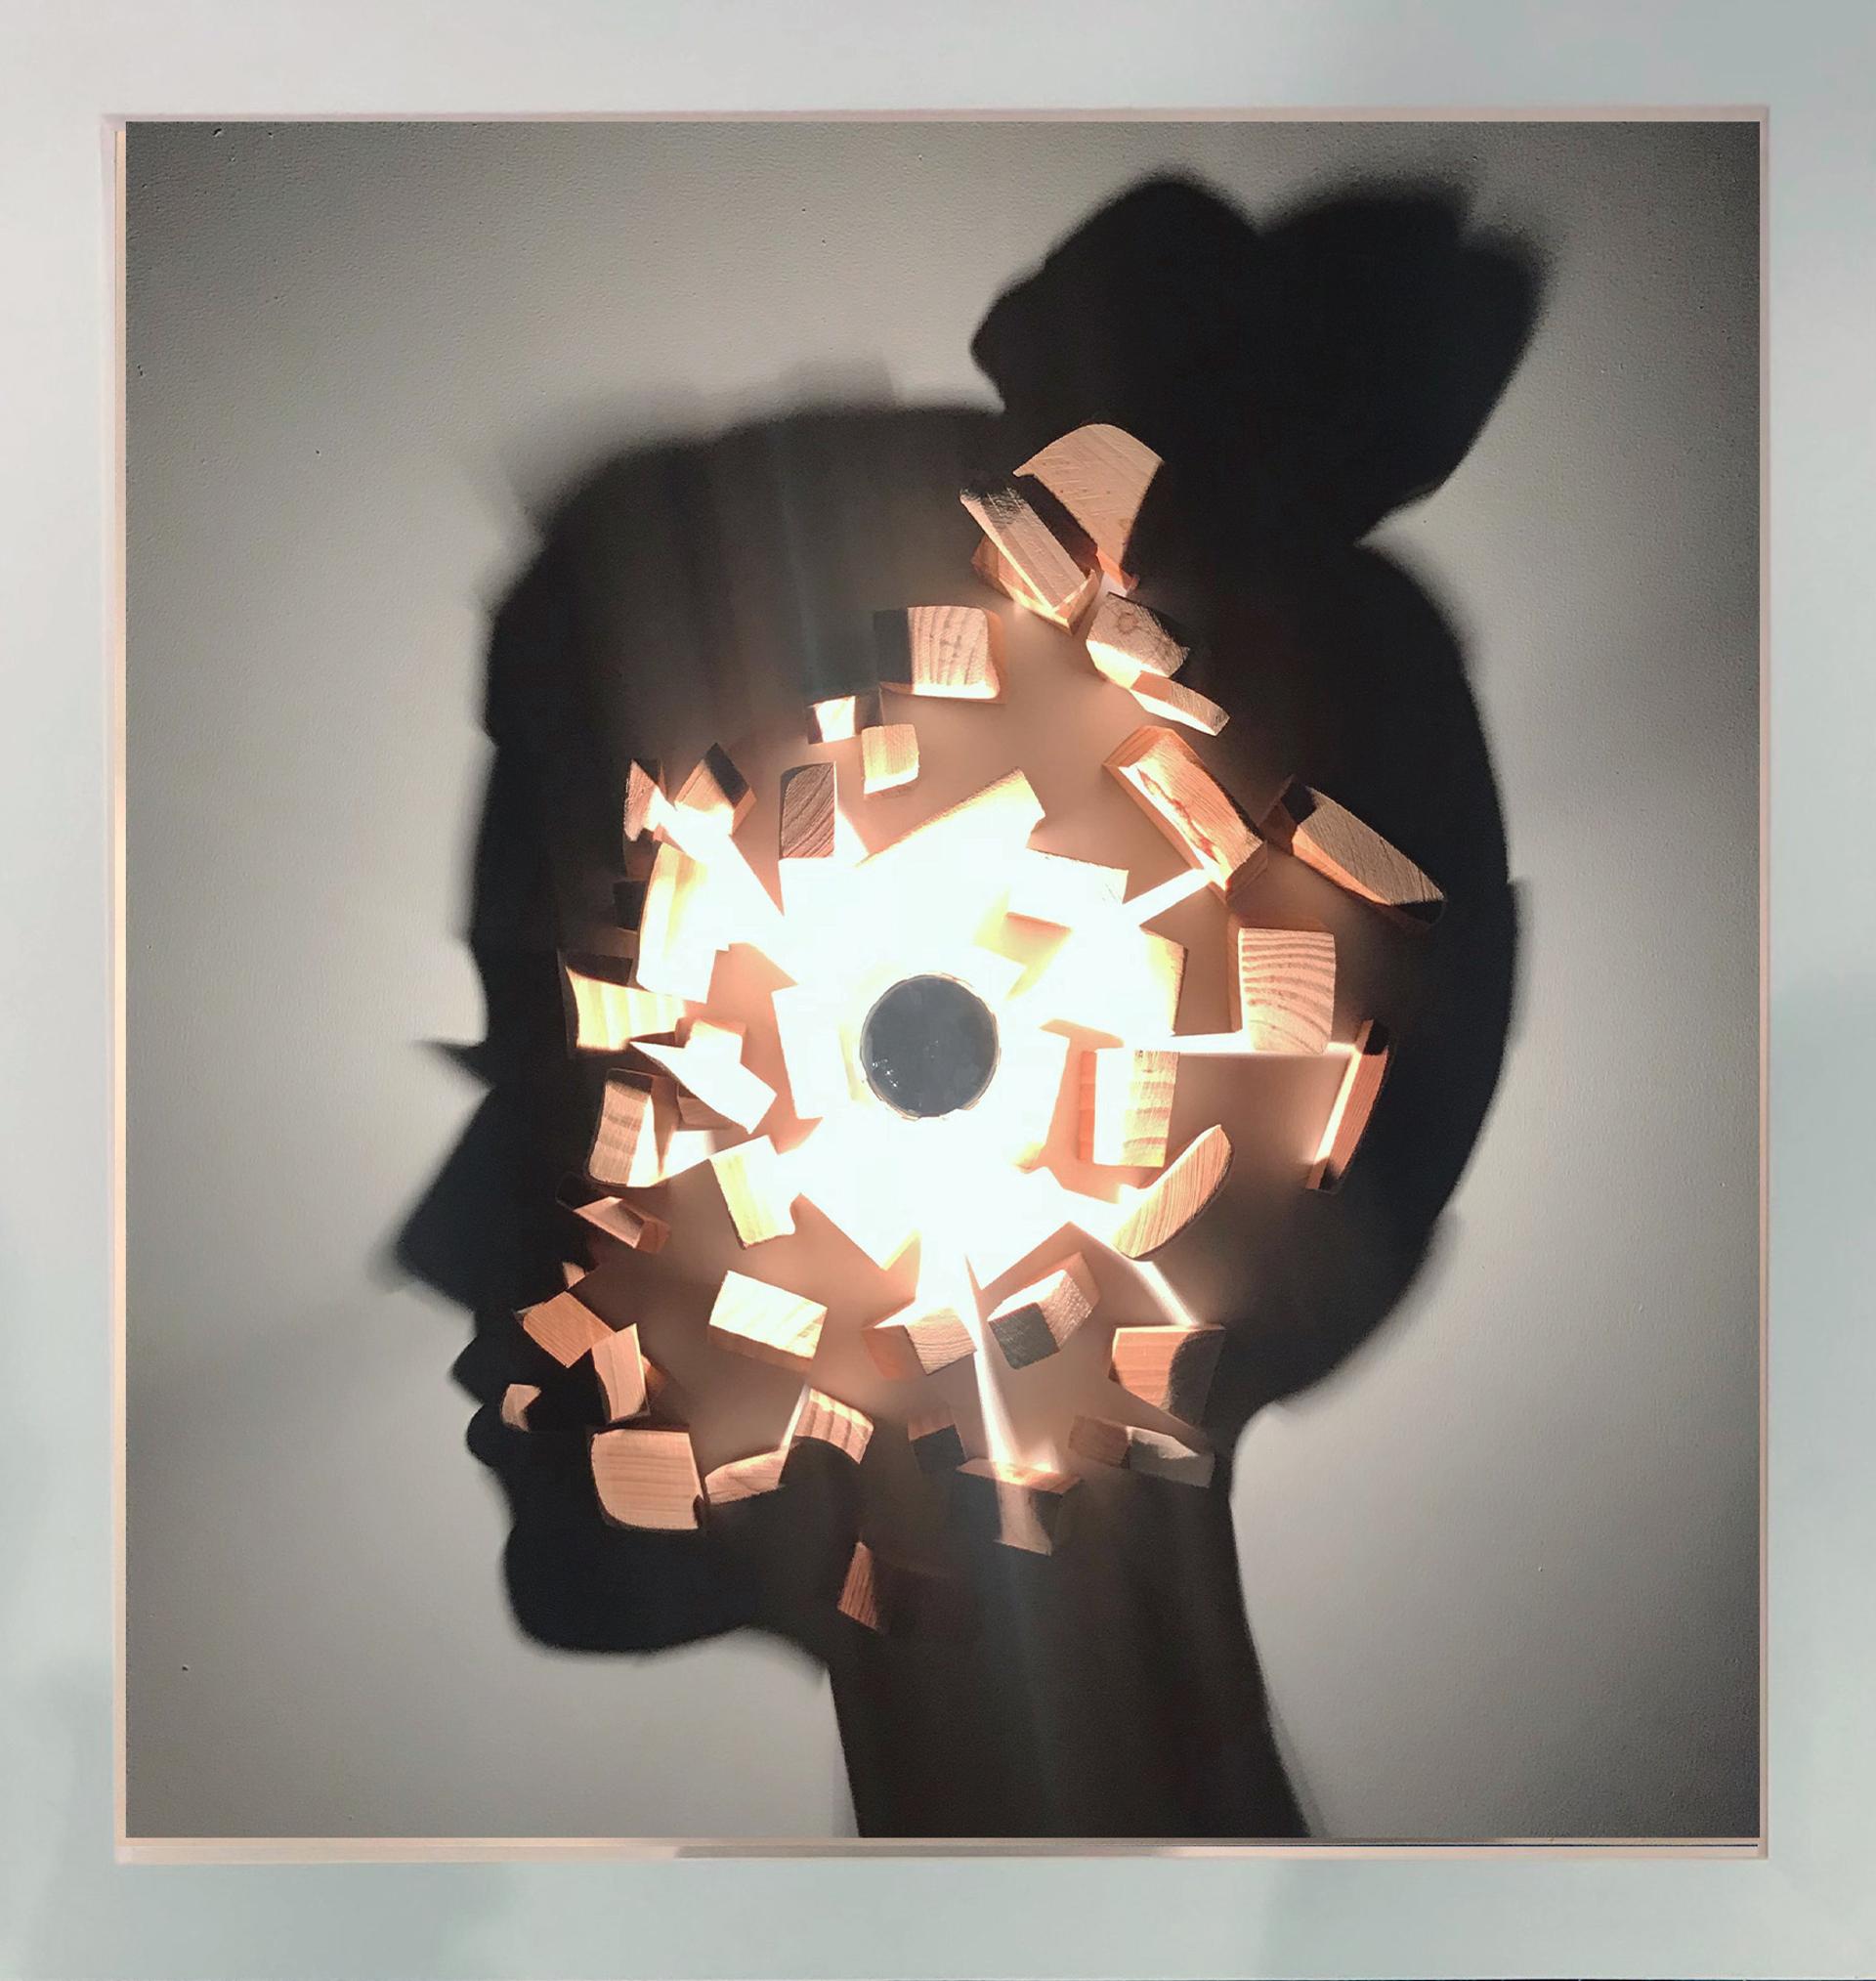 Juliana by J.P. Goncalves, Silhouette